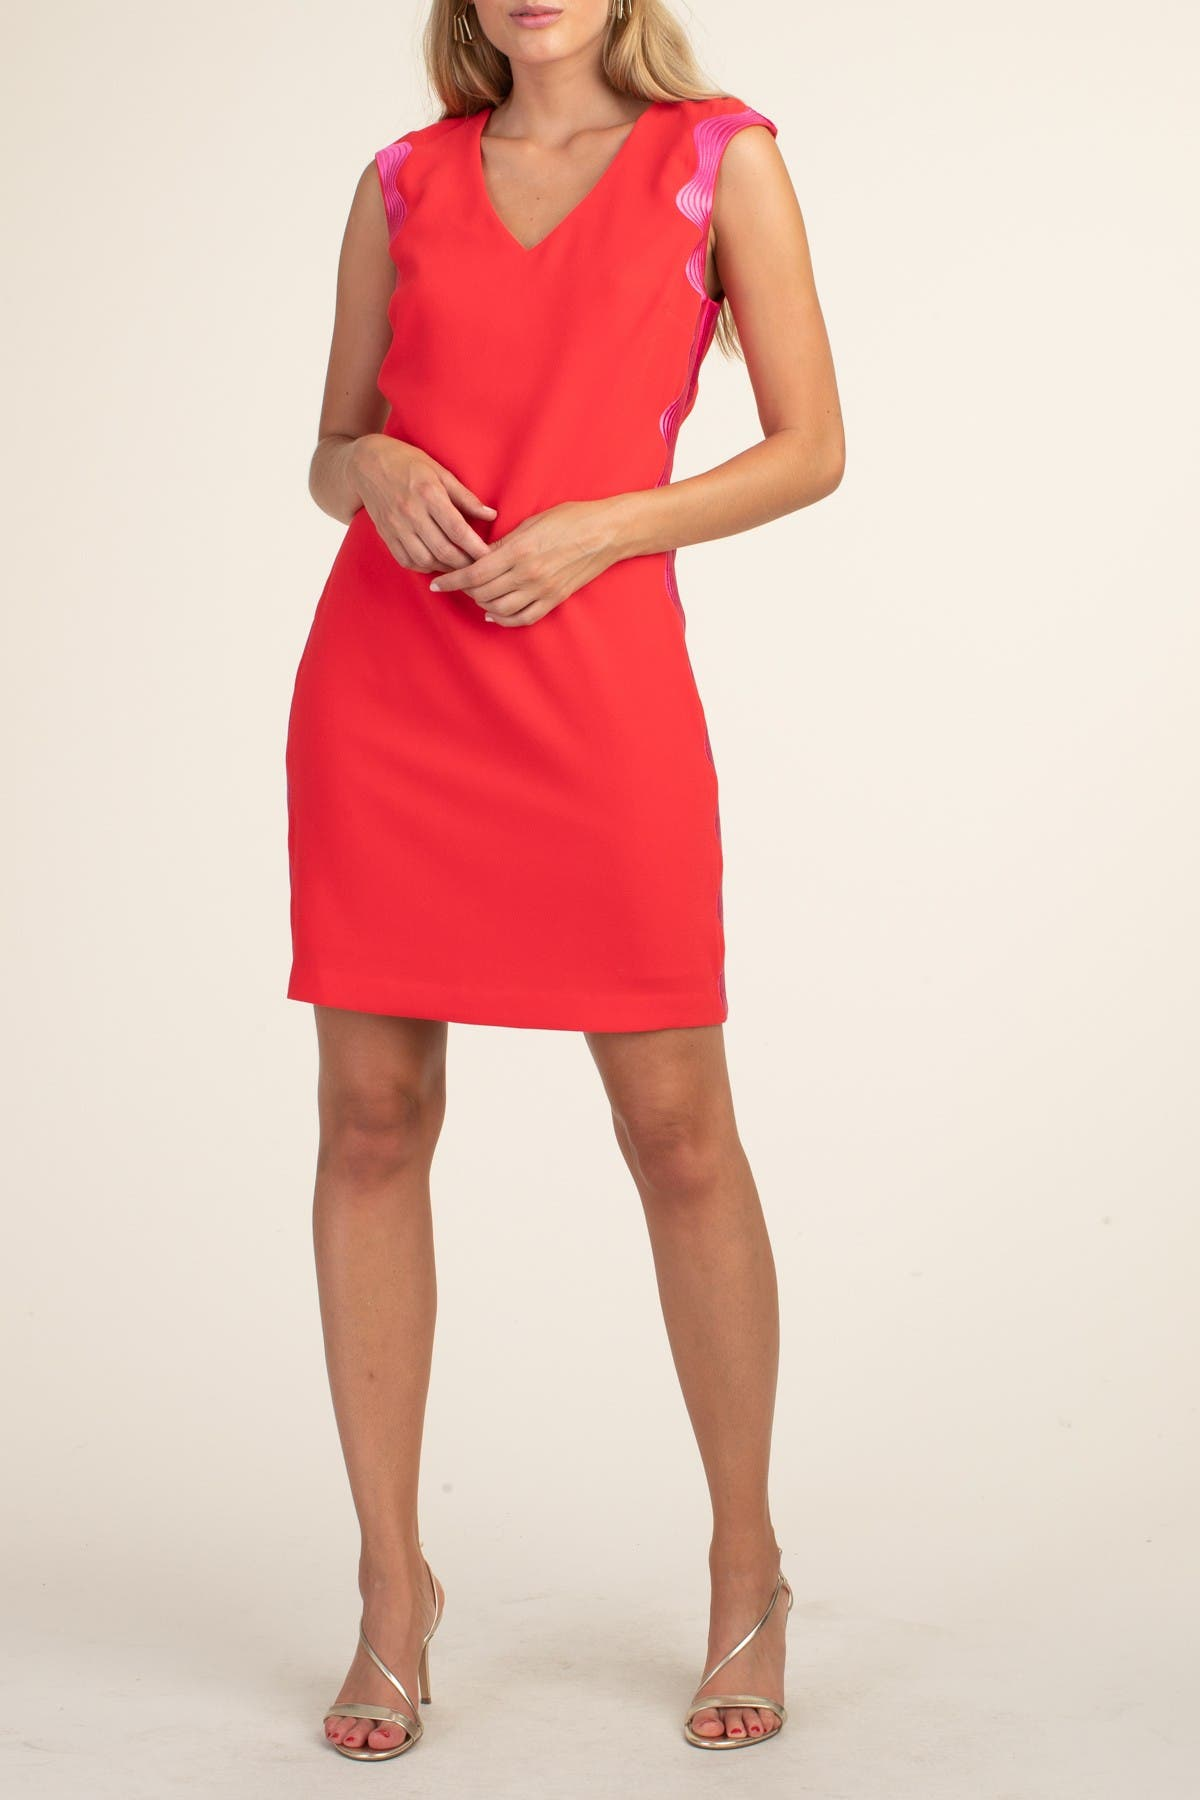 Image of Trina Turk Enjoyable Dress